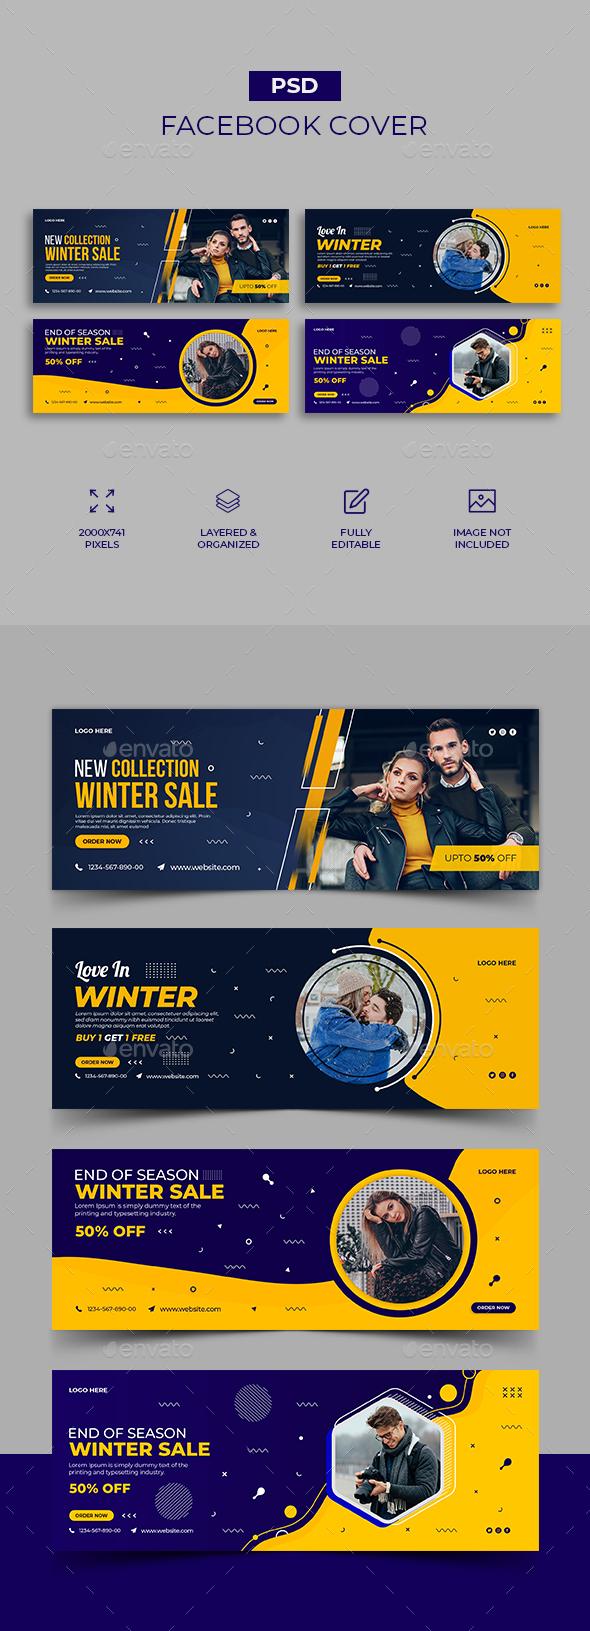 Winter fashion sale Facebook Cover Template